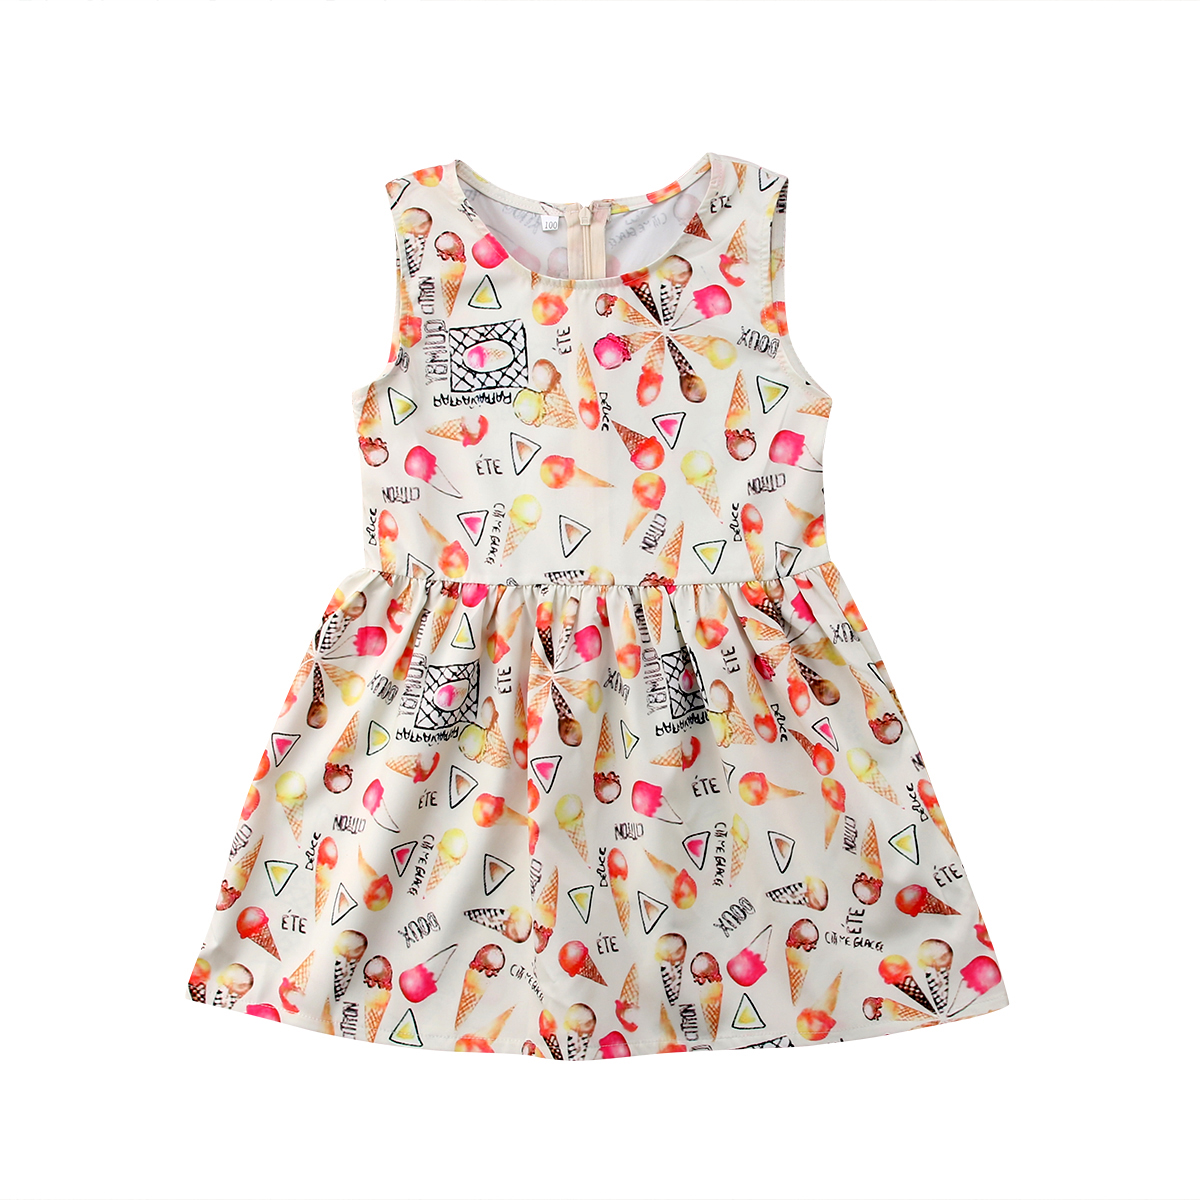 Toddler Kids Baby Girls Summer Icecream Sleeveless Princess Dress Girls Outfits Clothes